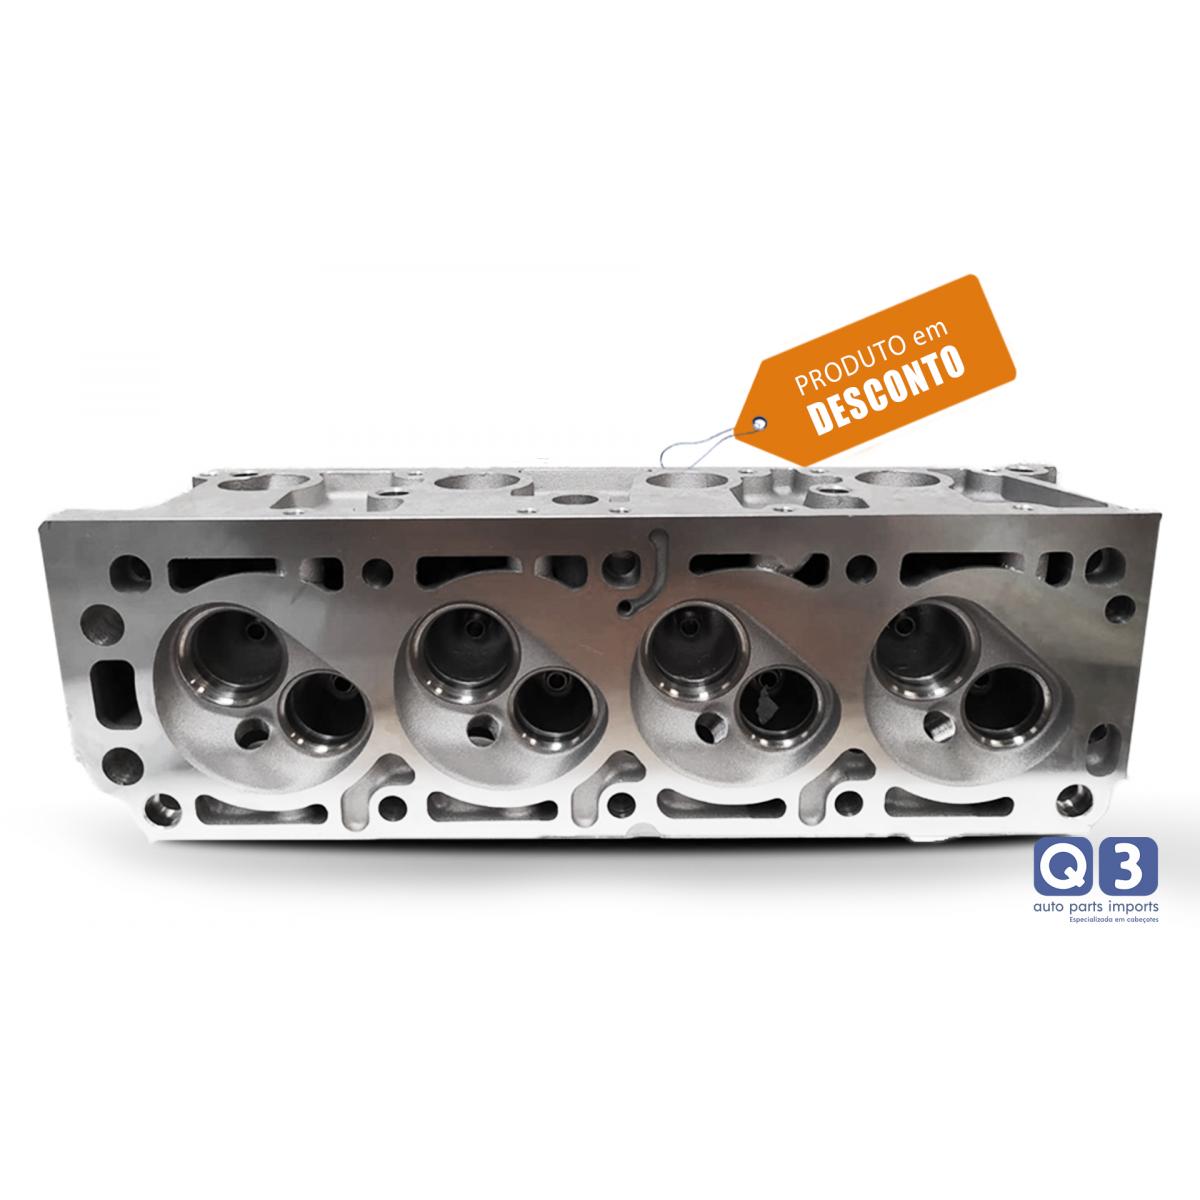 Cabeçote GM Chevrolet Astra | Vectra | Zafira | Monza 2.0 8v Novo (R90209896)